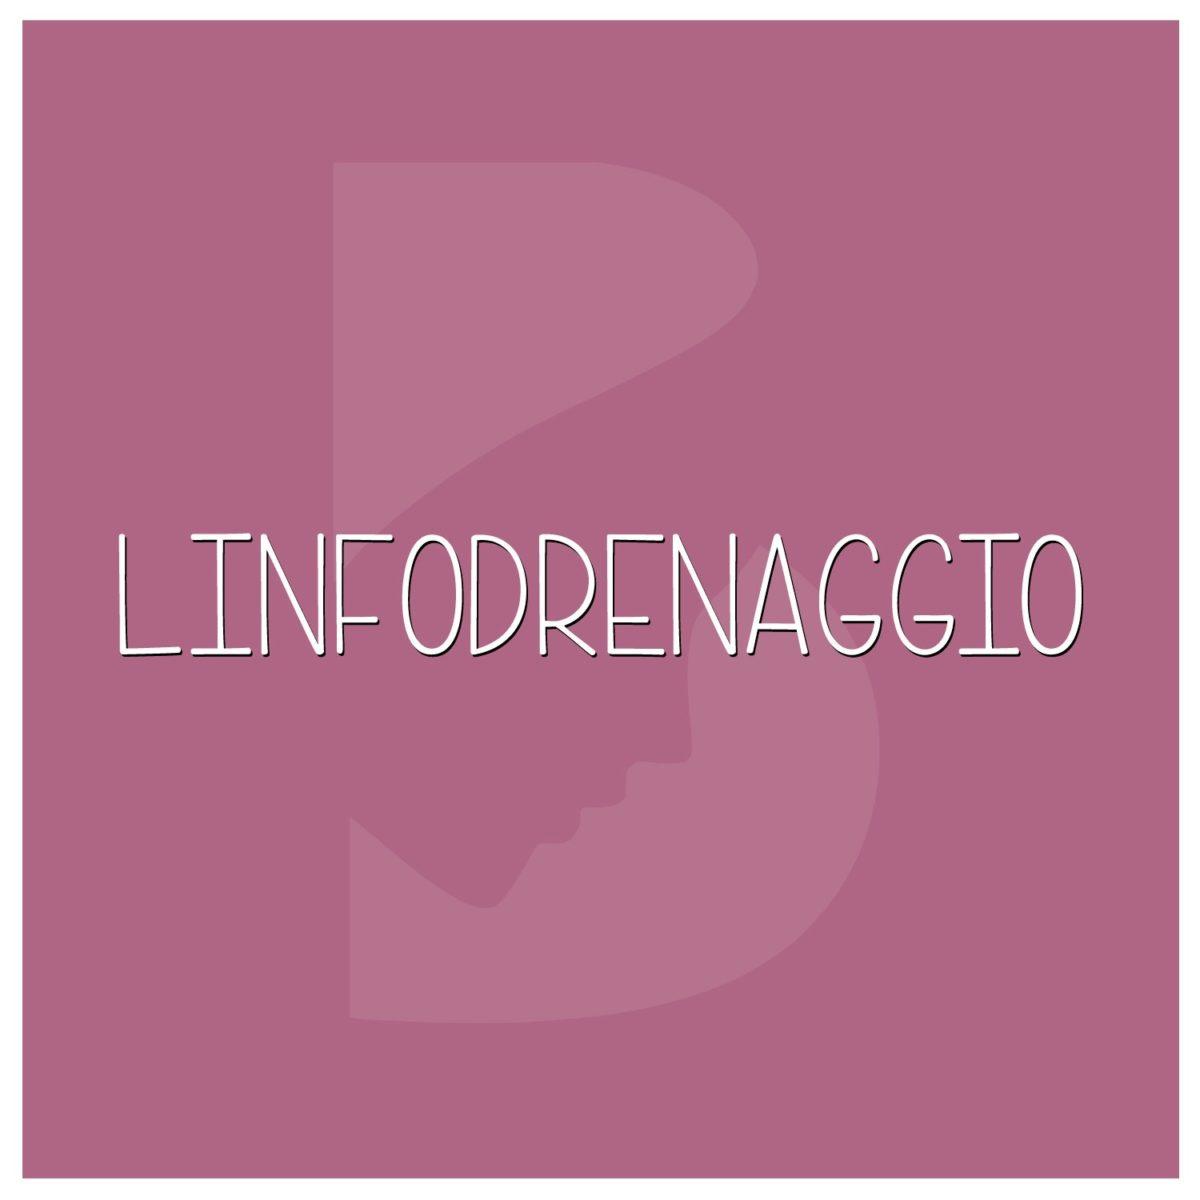 Linfodrenaggio-manuale-VodderLeduc-1200x1200.jpeg